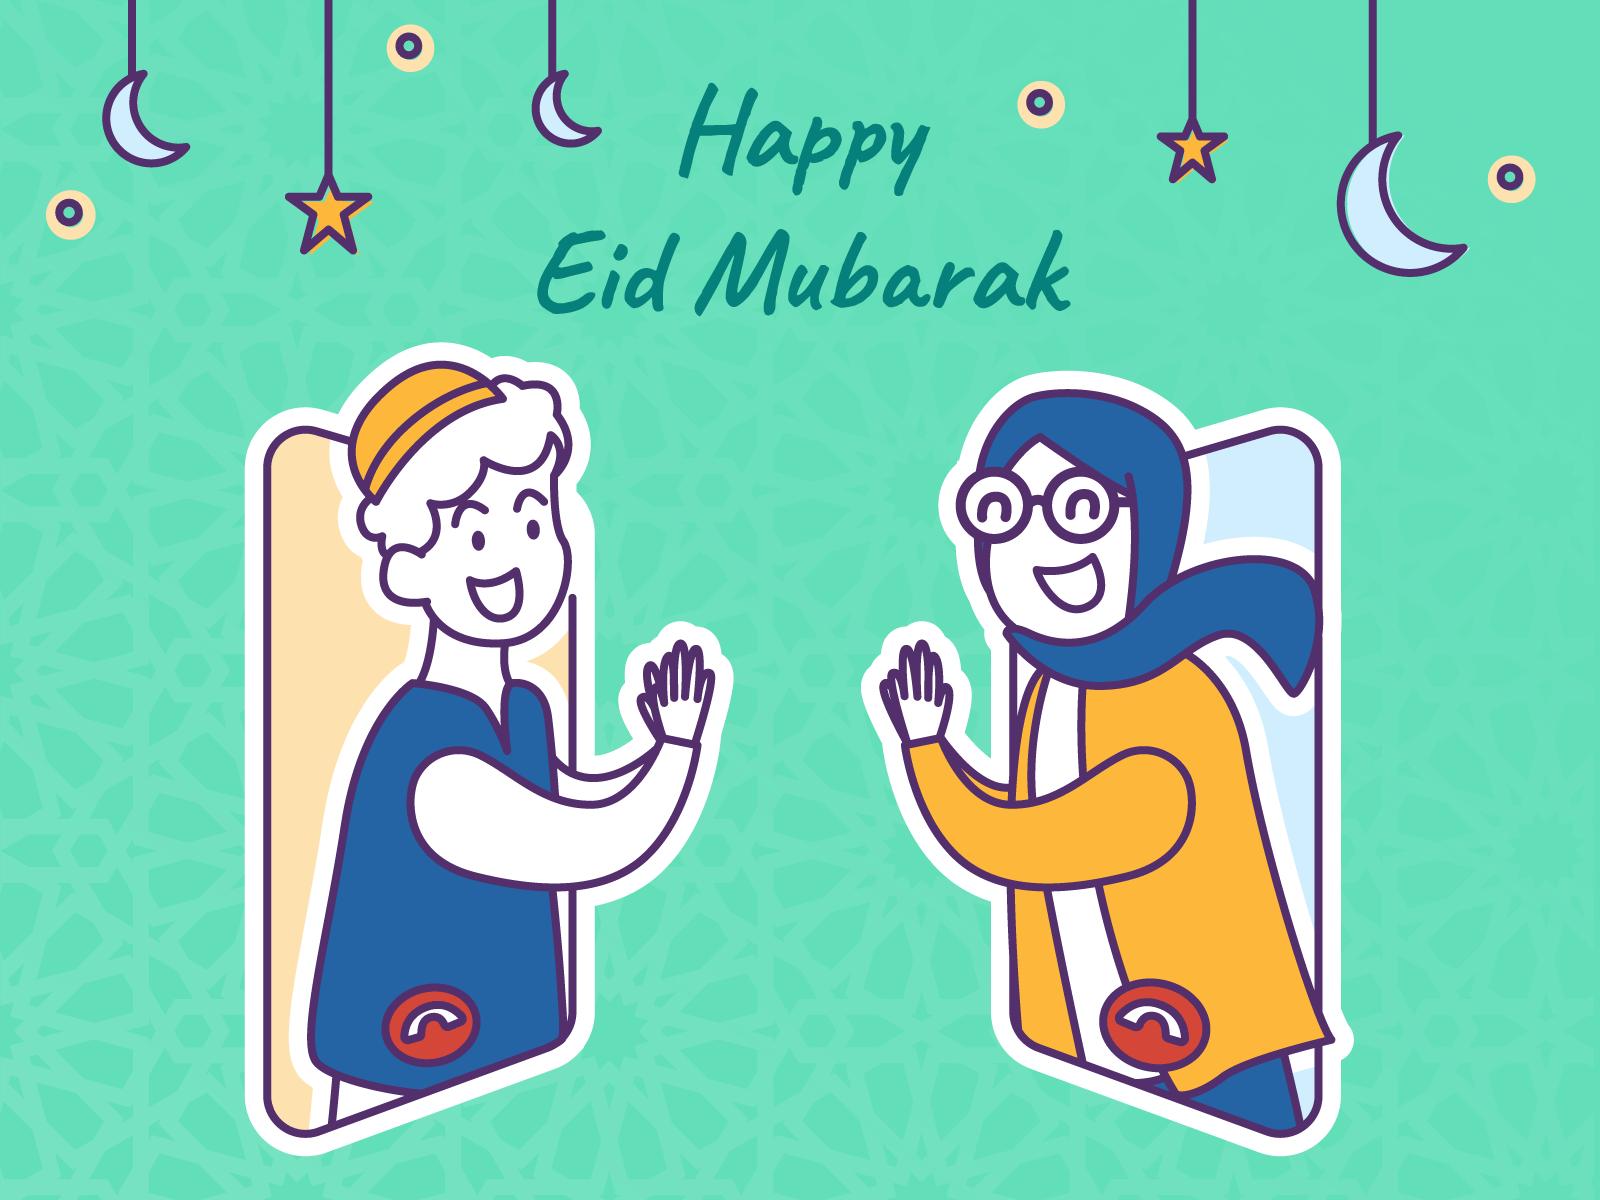 eid mubarak greeting cardfauzan aldi pradana on dribbble